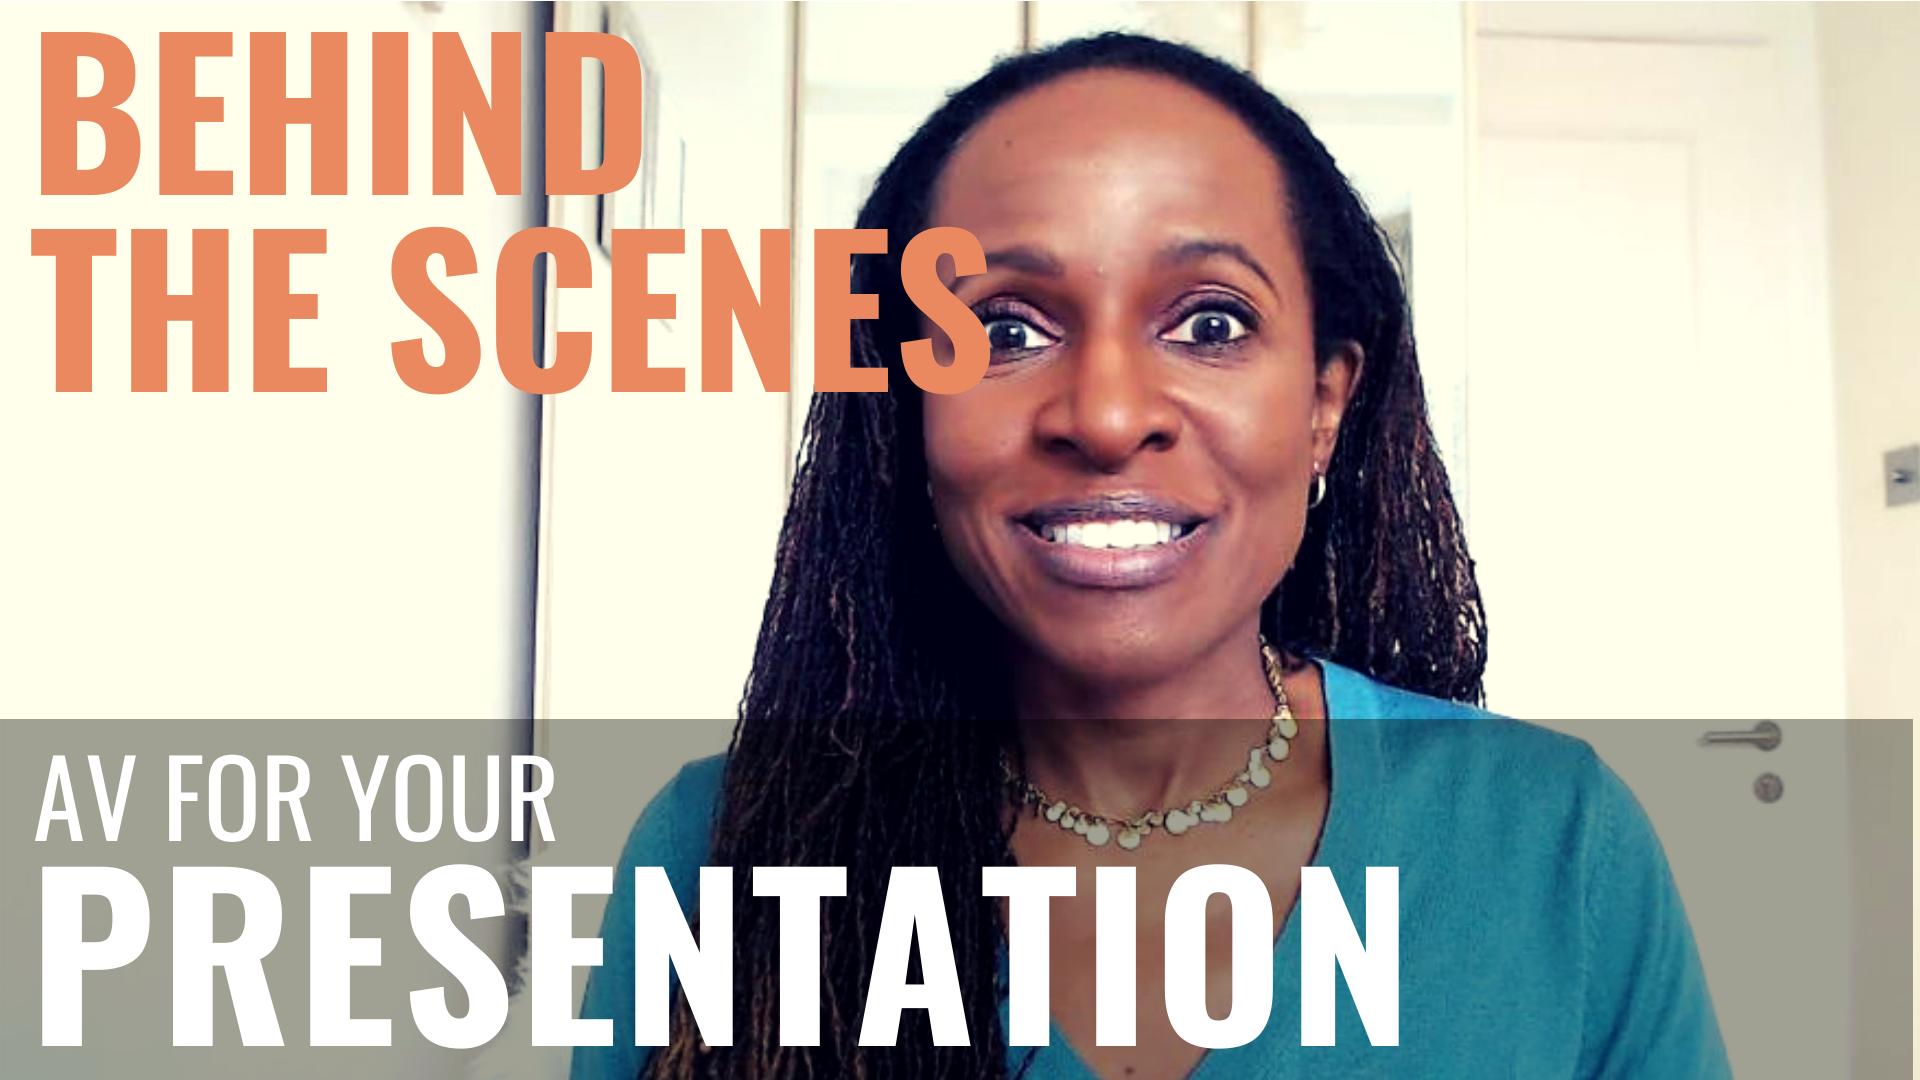 Public Speaking BEHIND THE SCENES – AV for your PRESENTATION